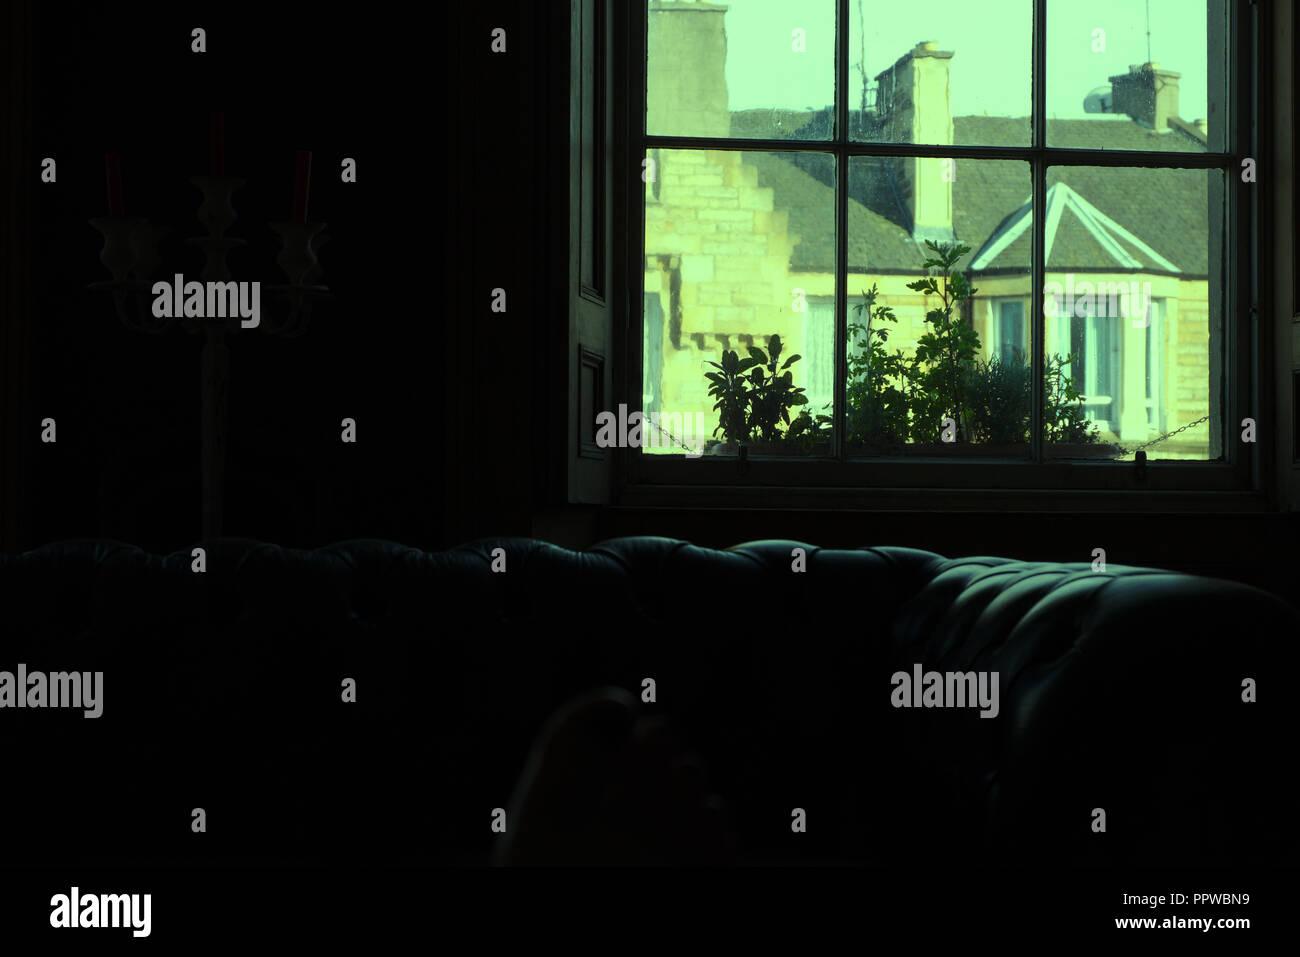 Home interior, Edinburgh, Scotland - Stock Image